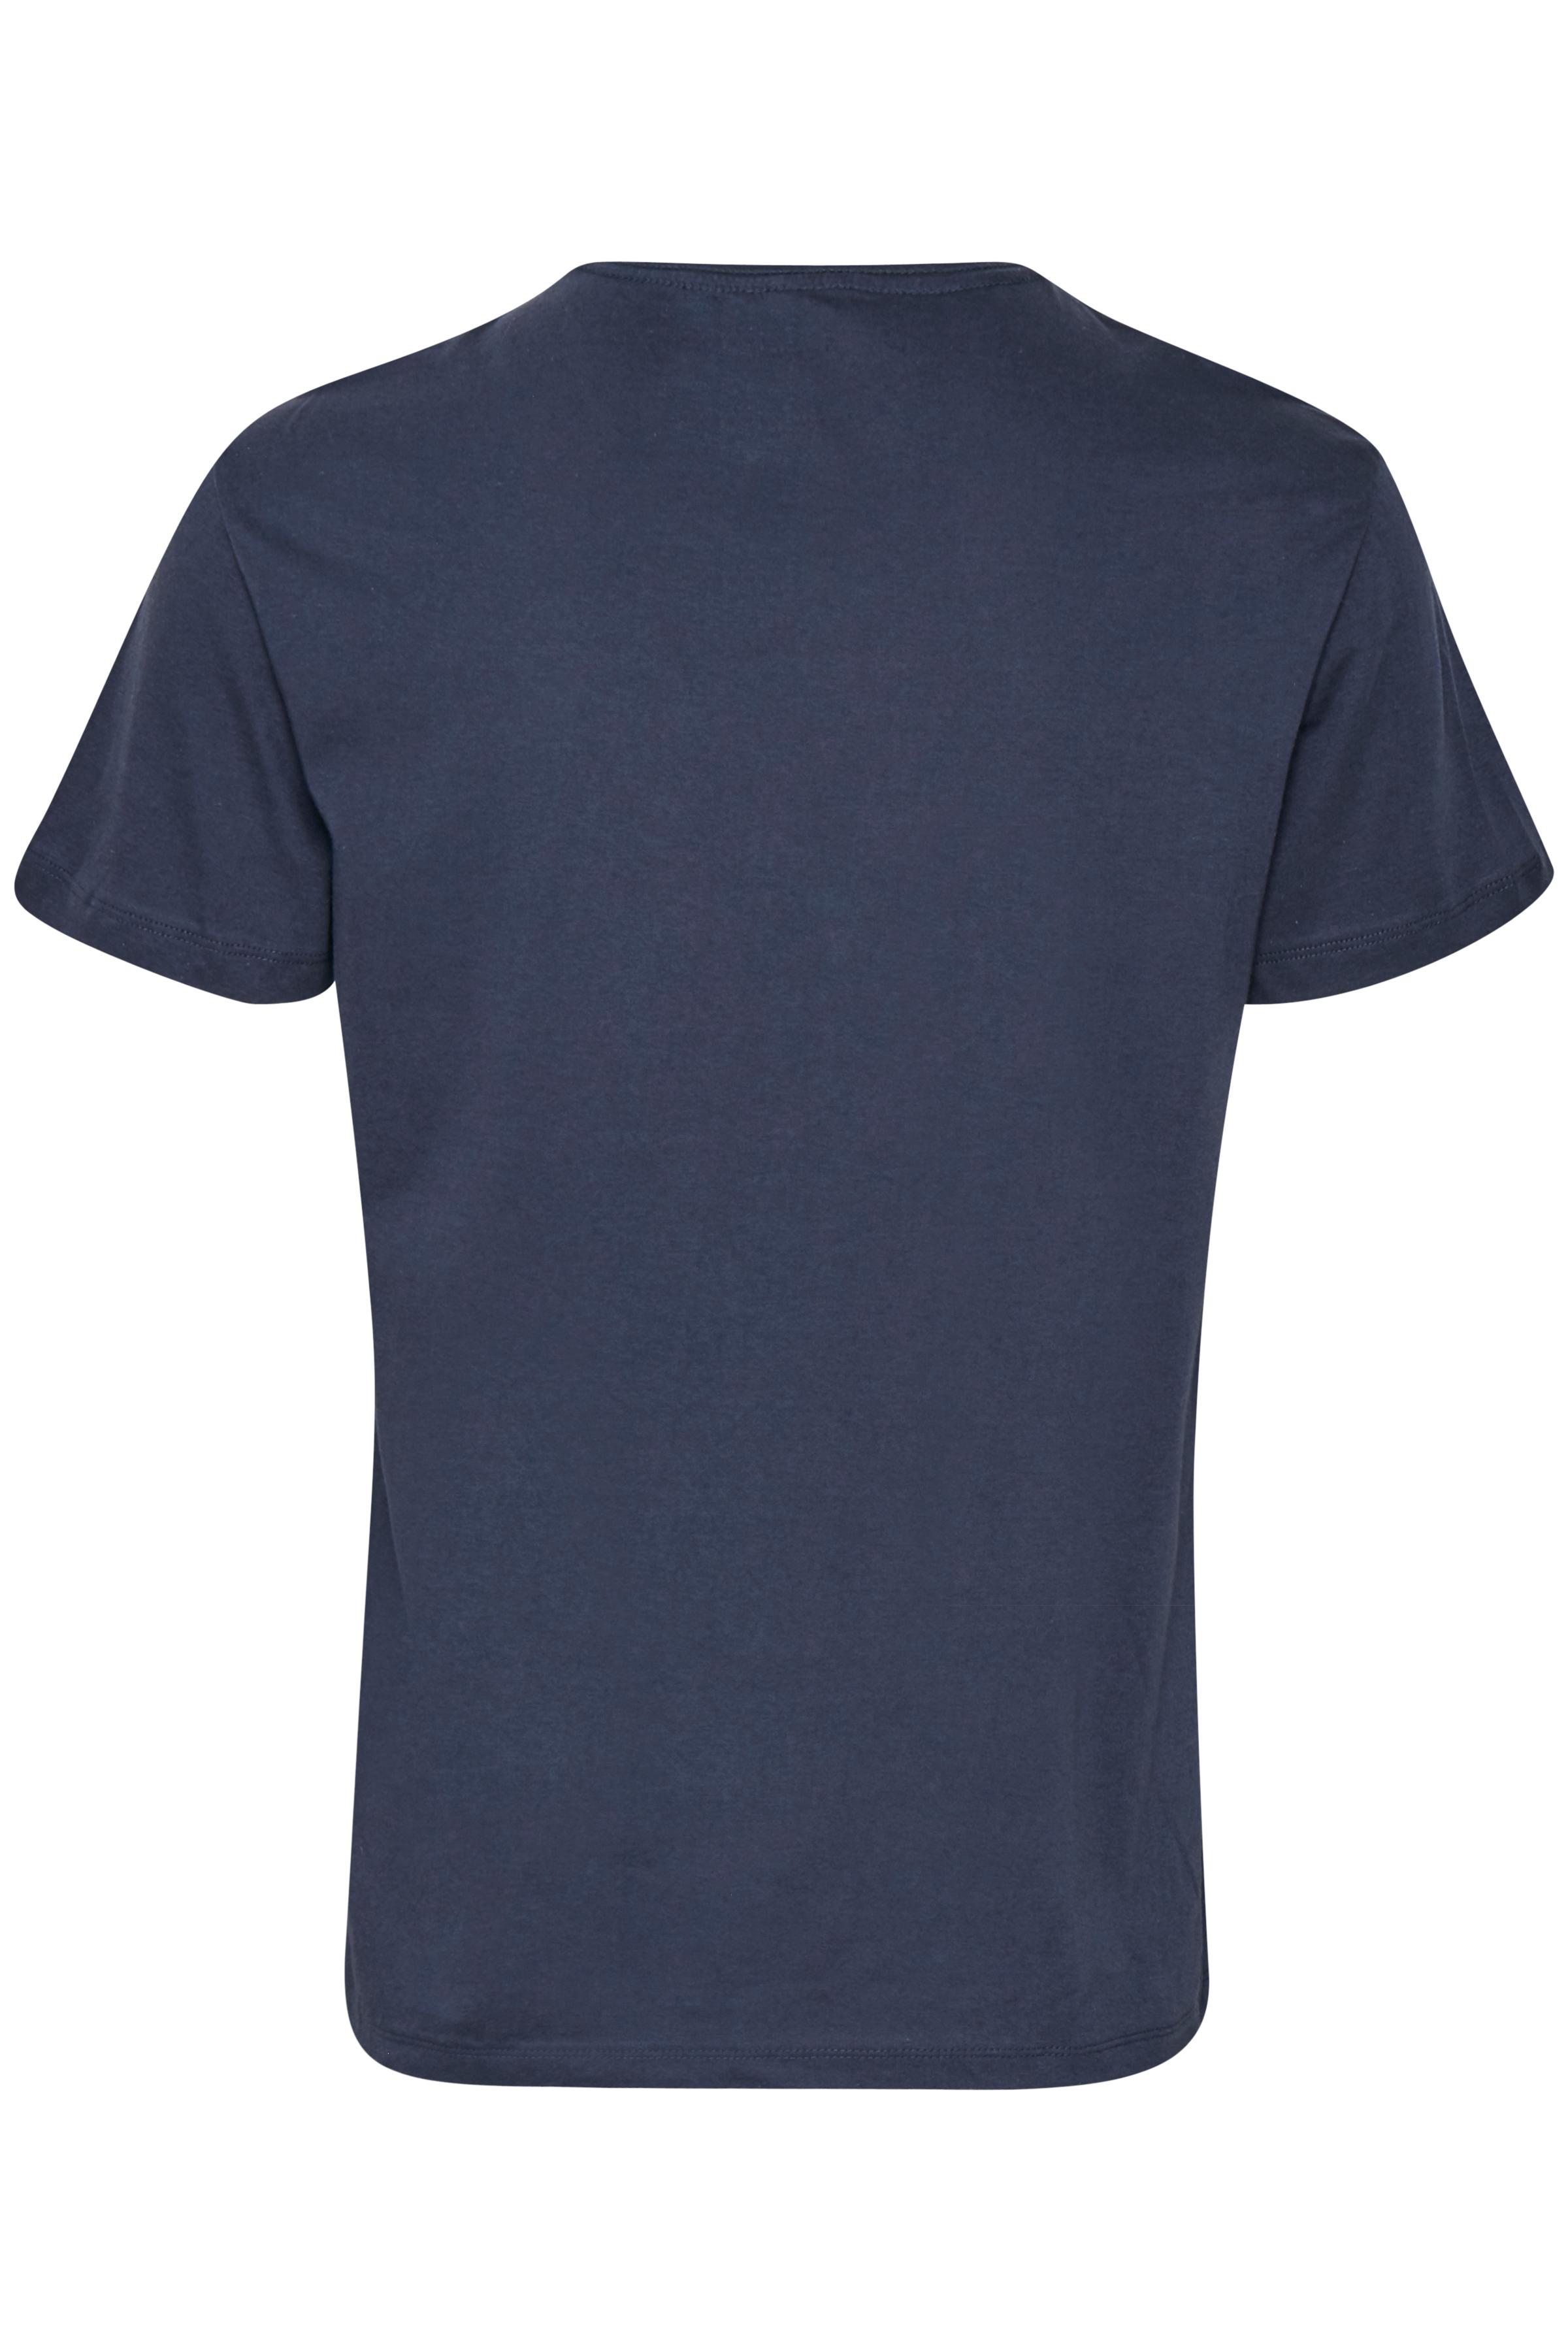 Mørk indigoblå Kortærmet T-shirt fra Blend He – Køb Mørk indigoblå Kortærmet T-shirt fra str. S-3XL her